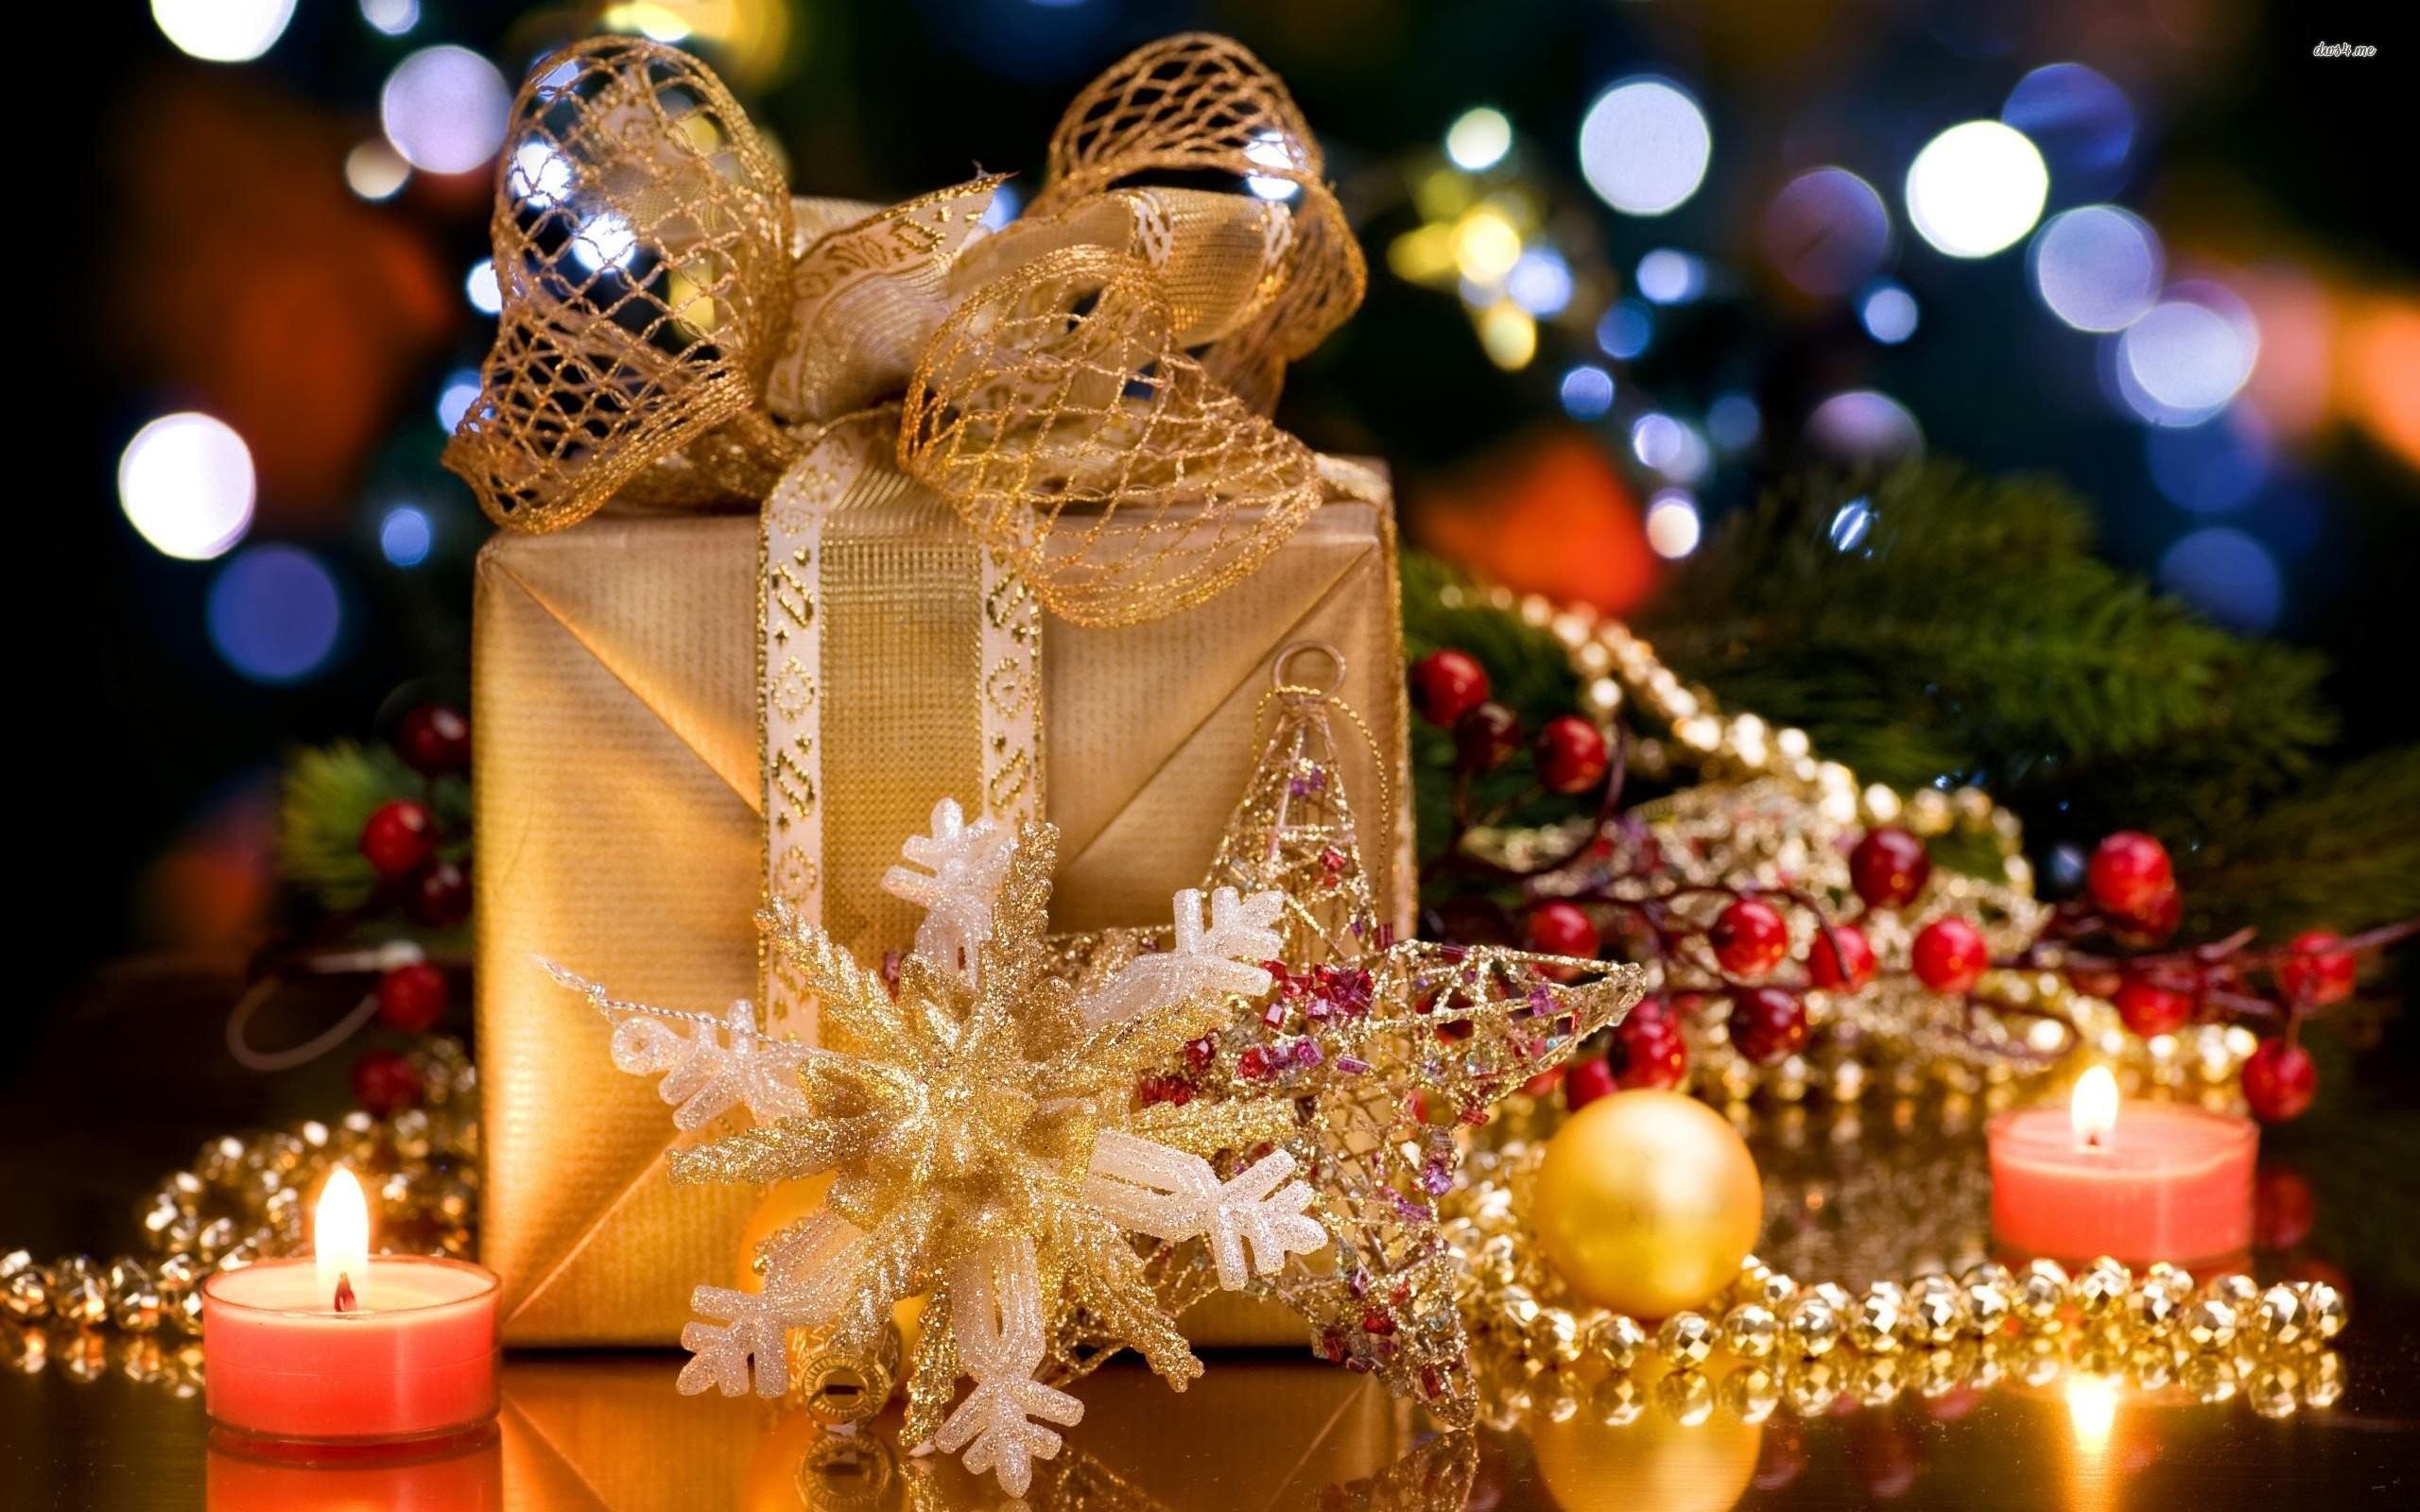 Res: 2560x1600, christmas gift 717747